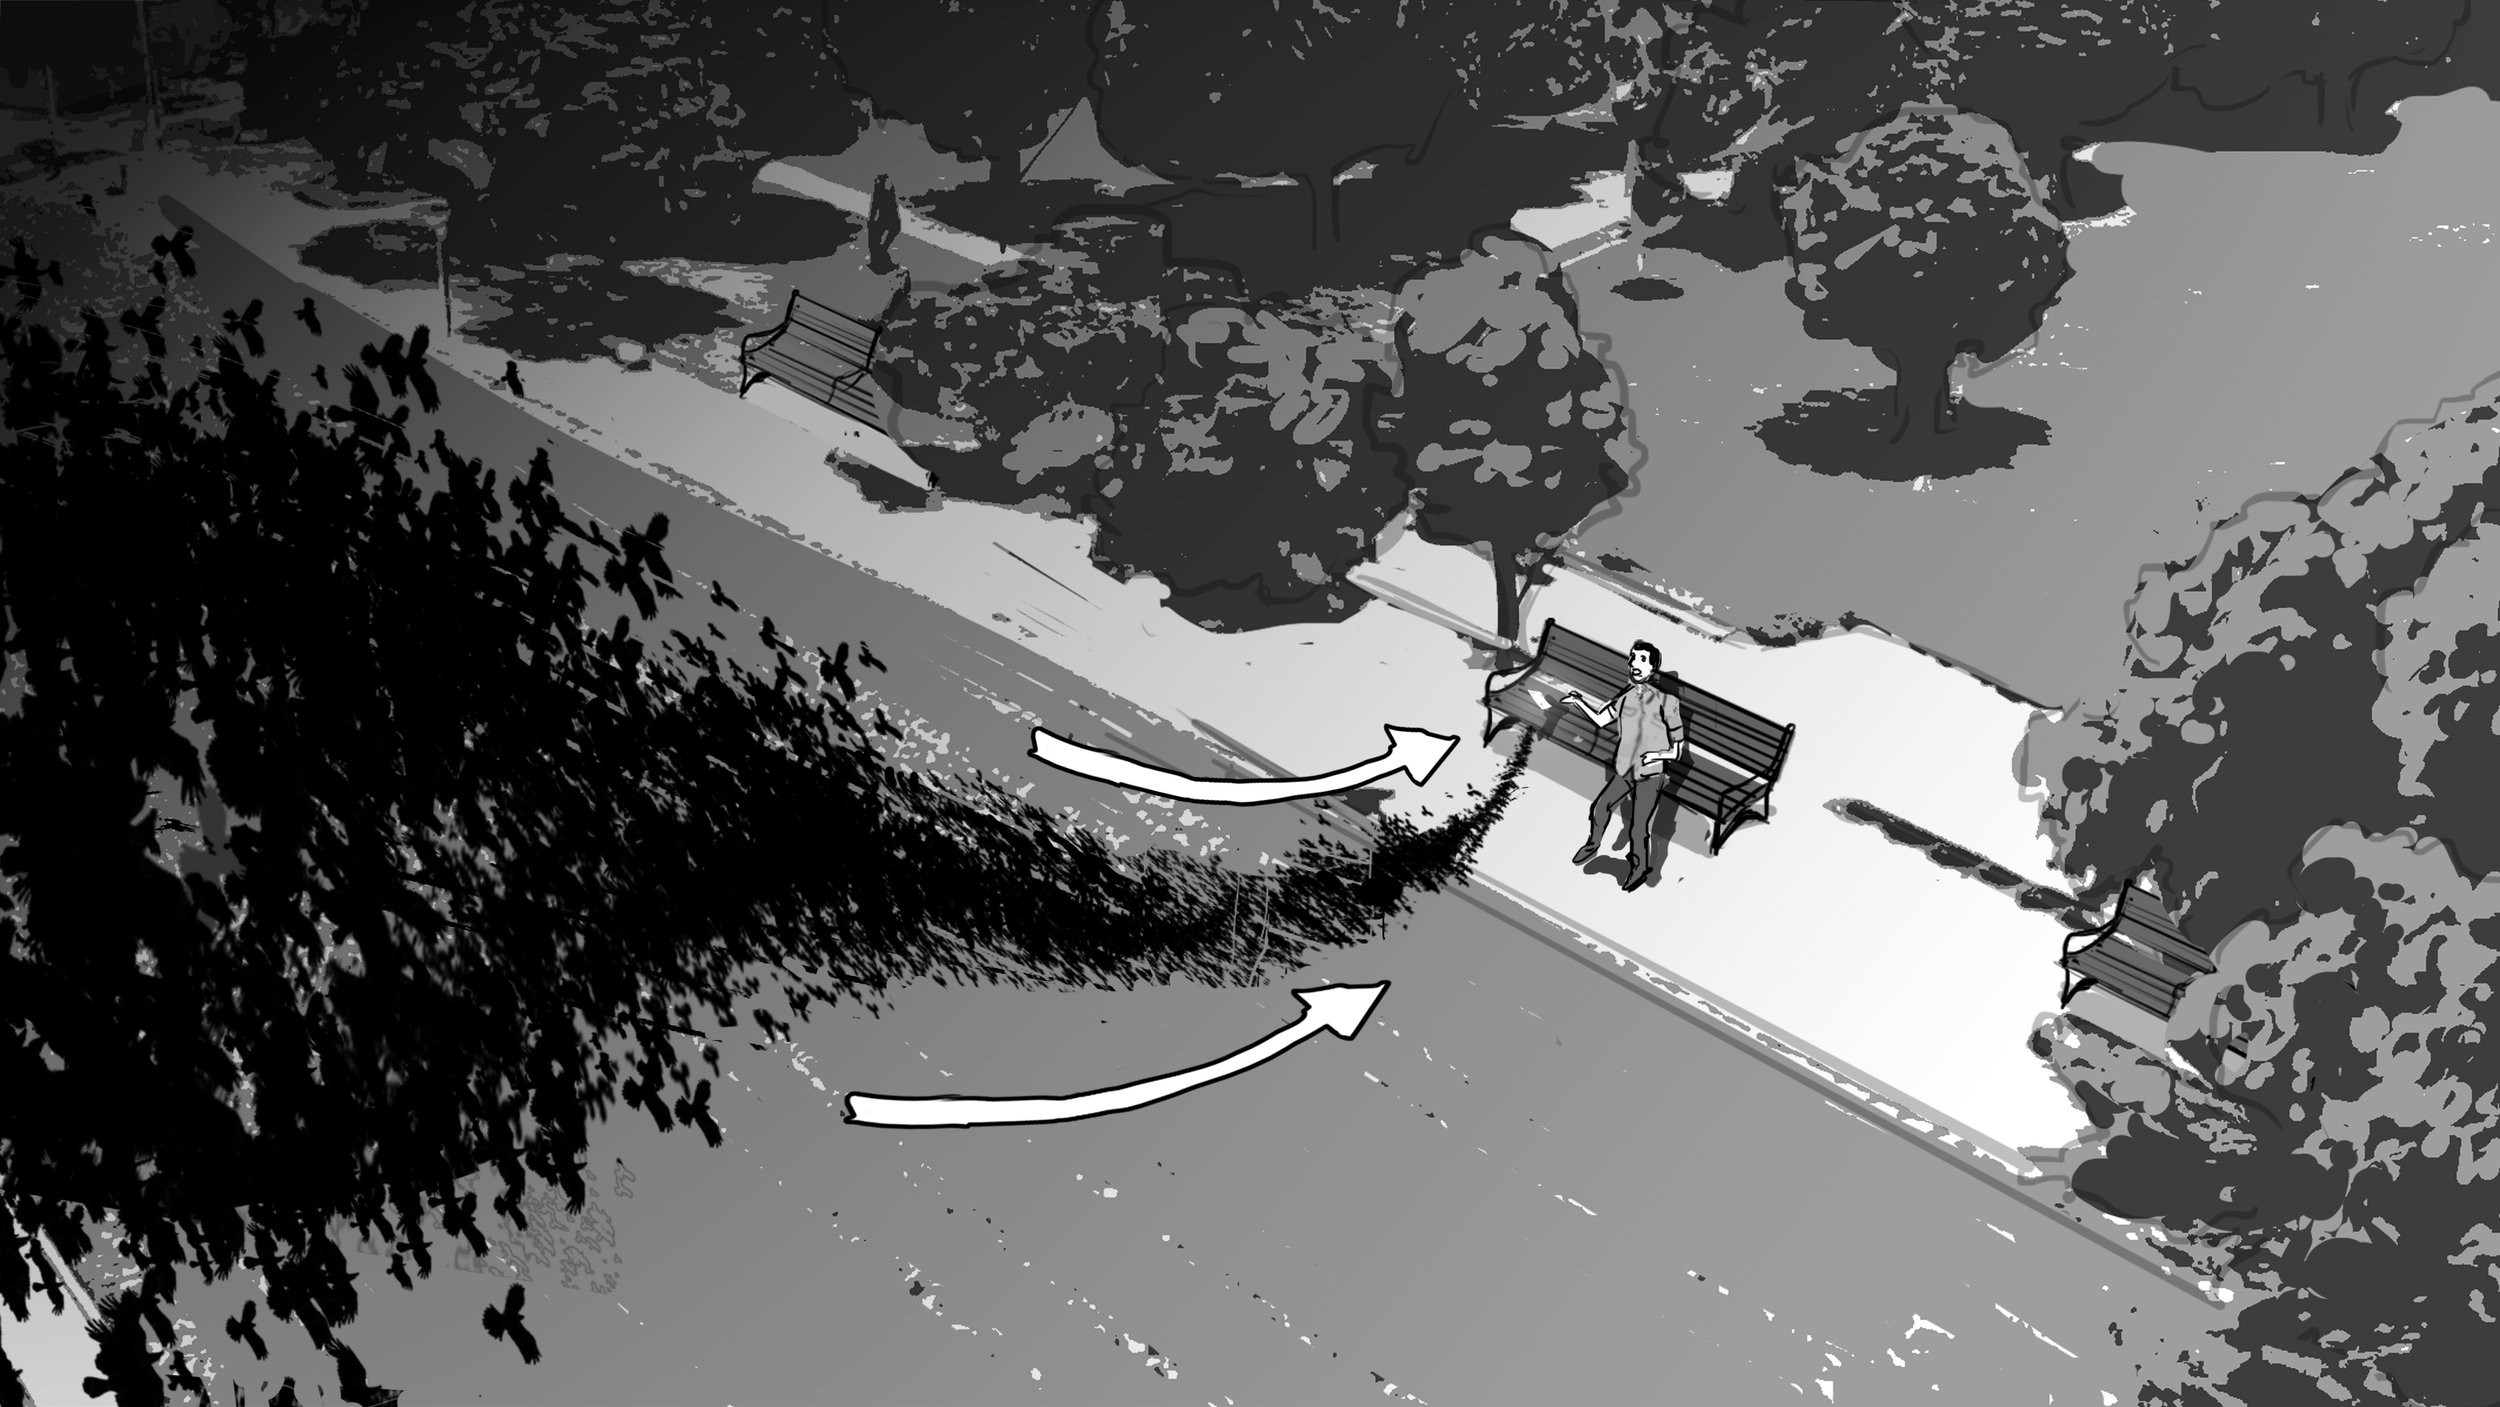 MLottery_storyboards_V02_11B.jpg